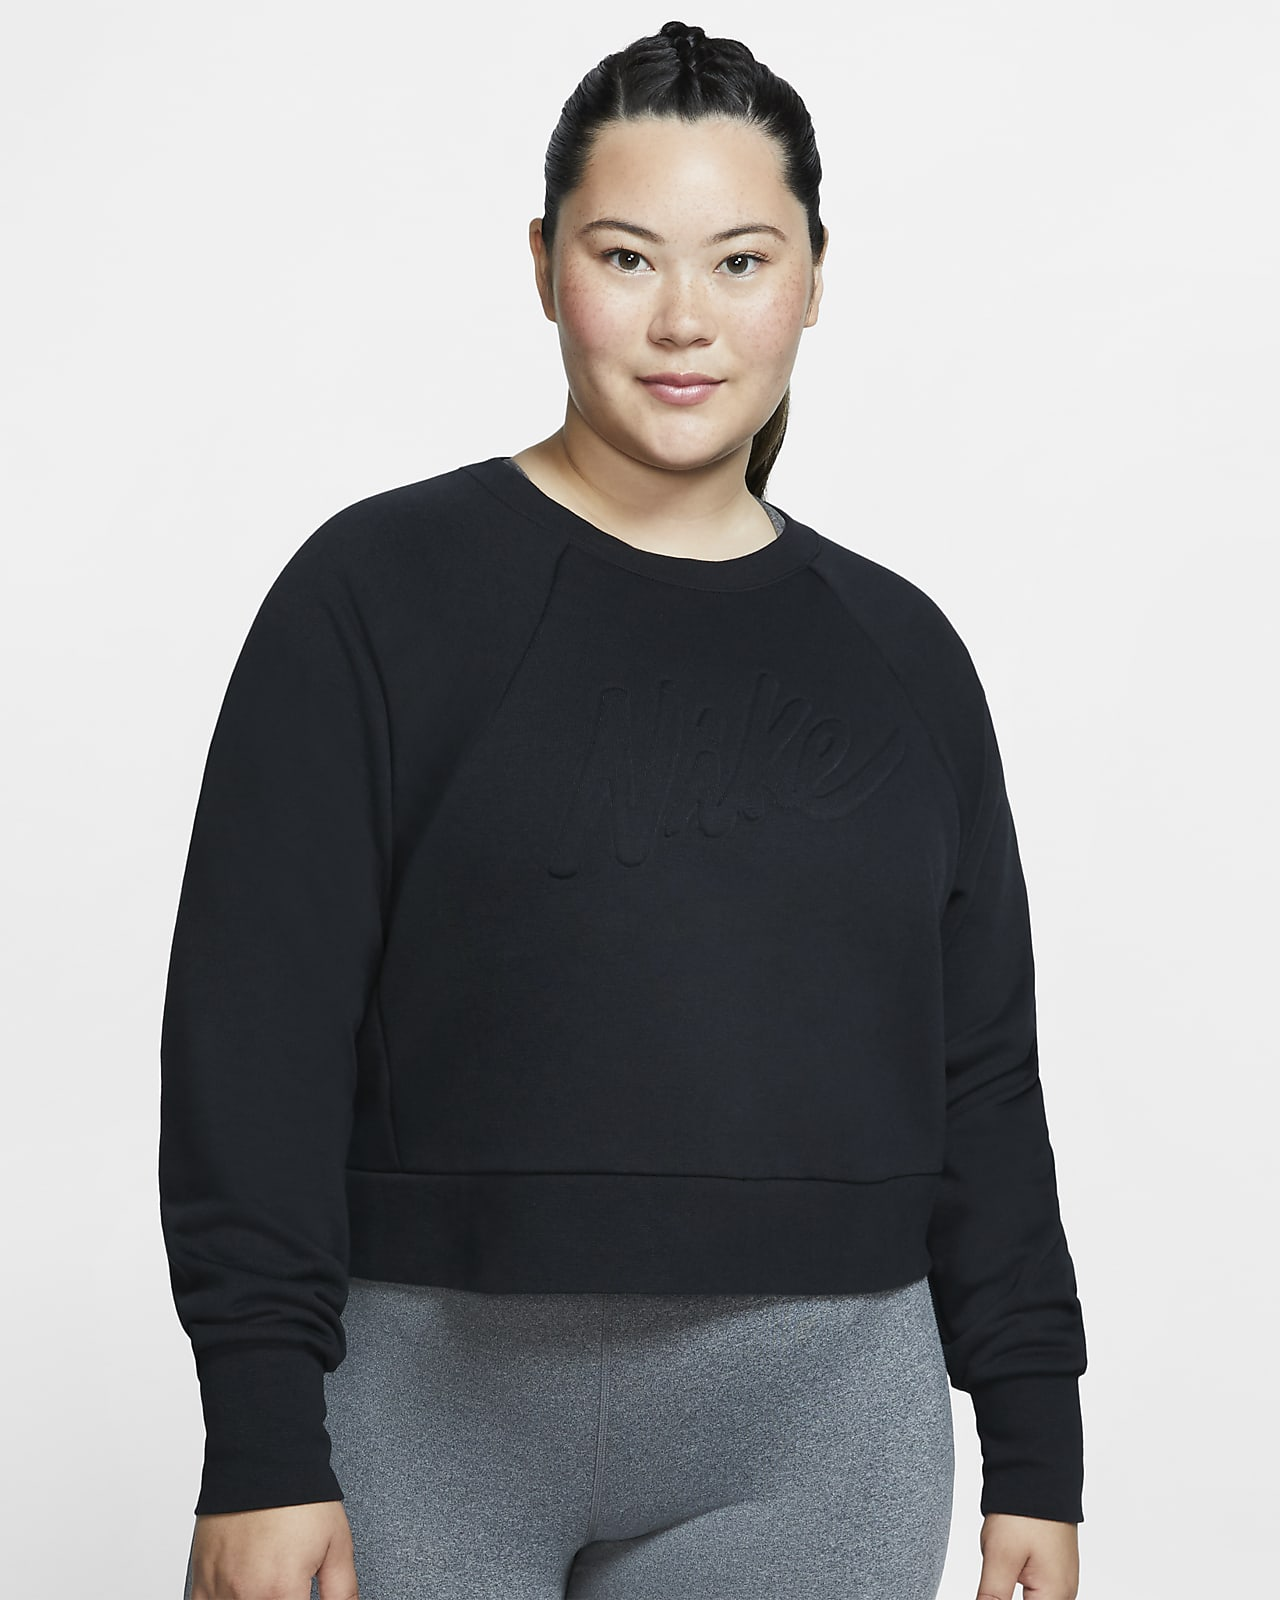 Nike Dri-FIT Luxe Women's Long-Sleeve Training Top (Plus Size)